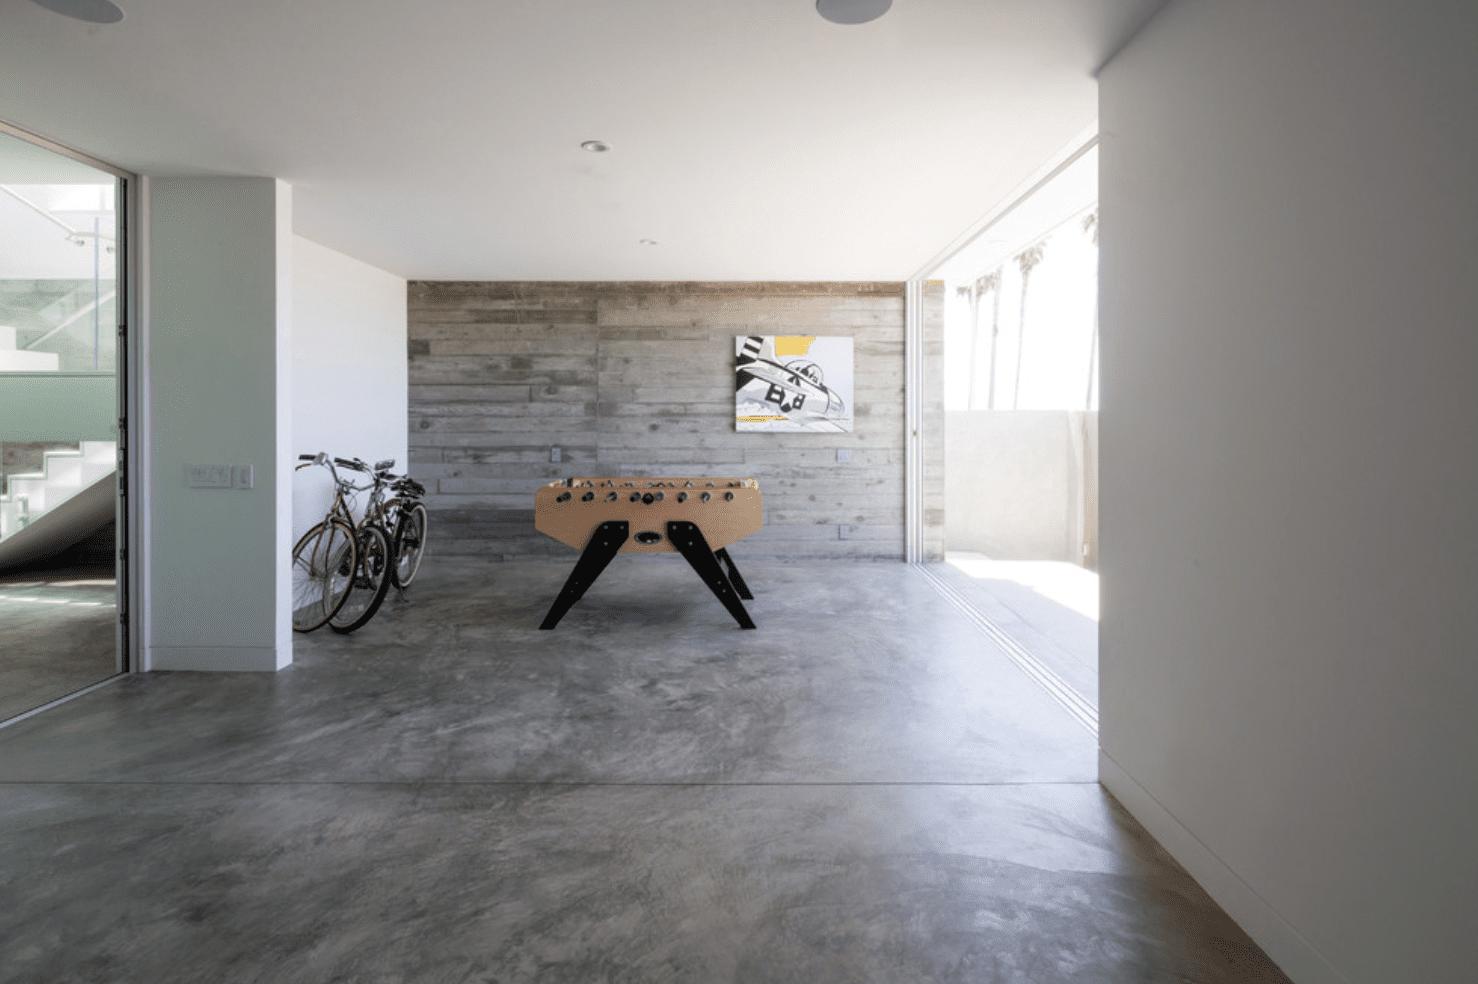 A spacious basement lit with a massive window